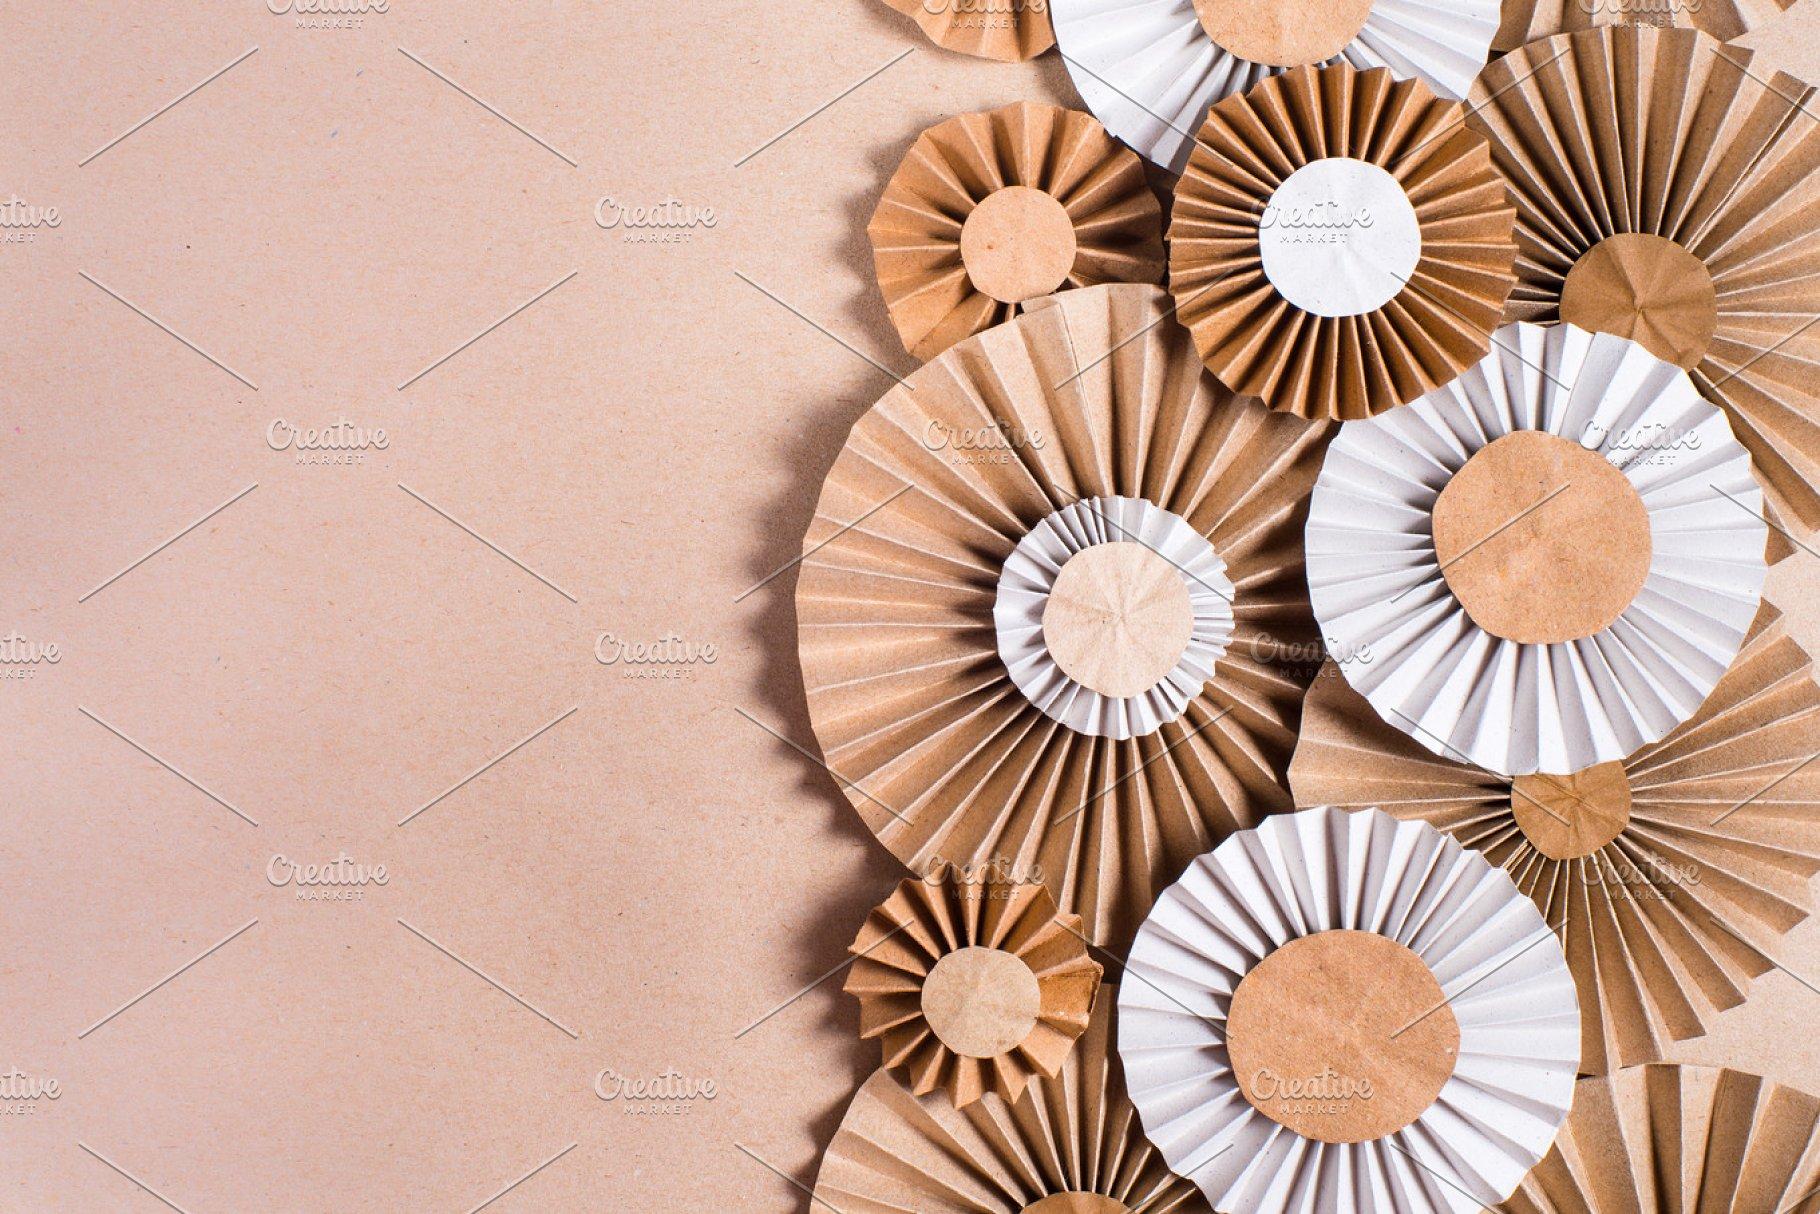 Craft Paper Rosette Flowers